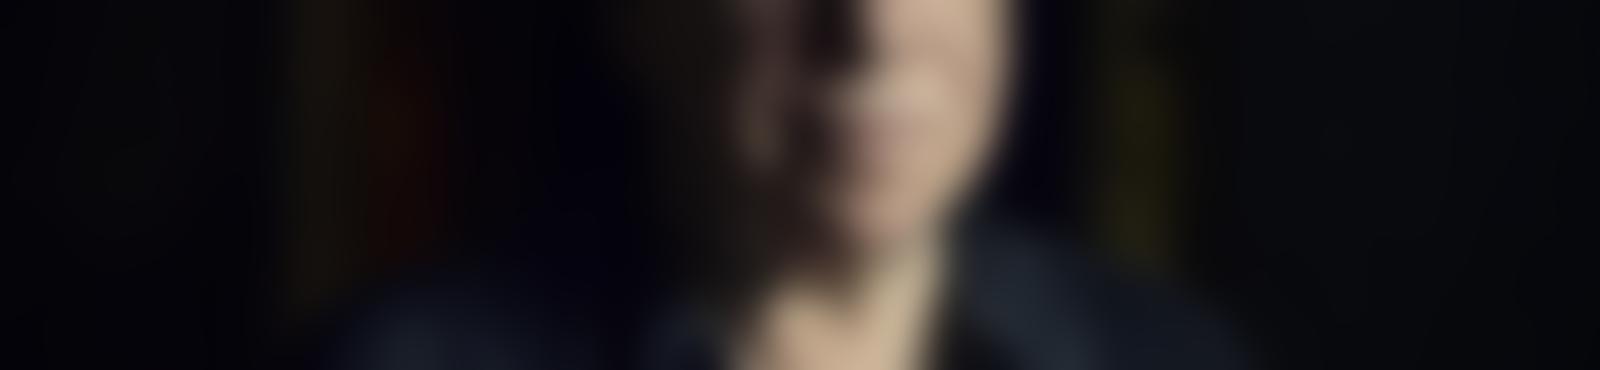 Blurred 7ef1a4fb efe2 4d08 a95f bf7437157cd2